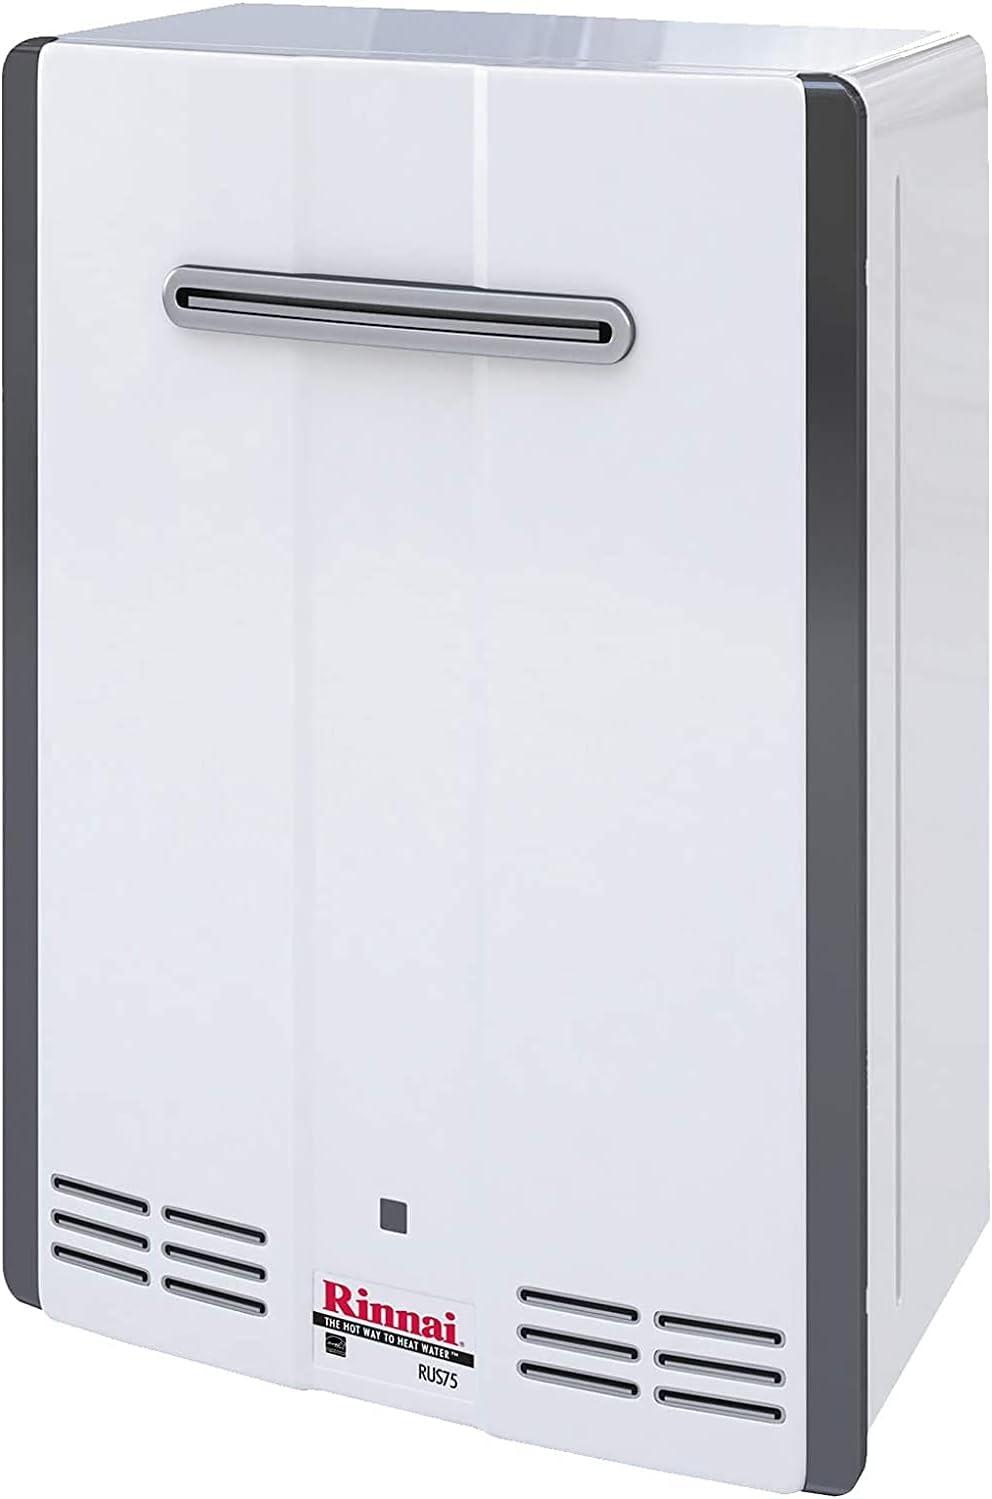 Rinnai RUS75eN Hot 至上 Water Heater 人気 Installation GPM Outdoor 7.5